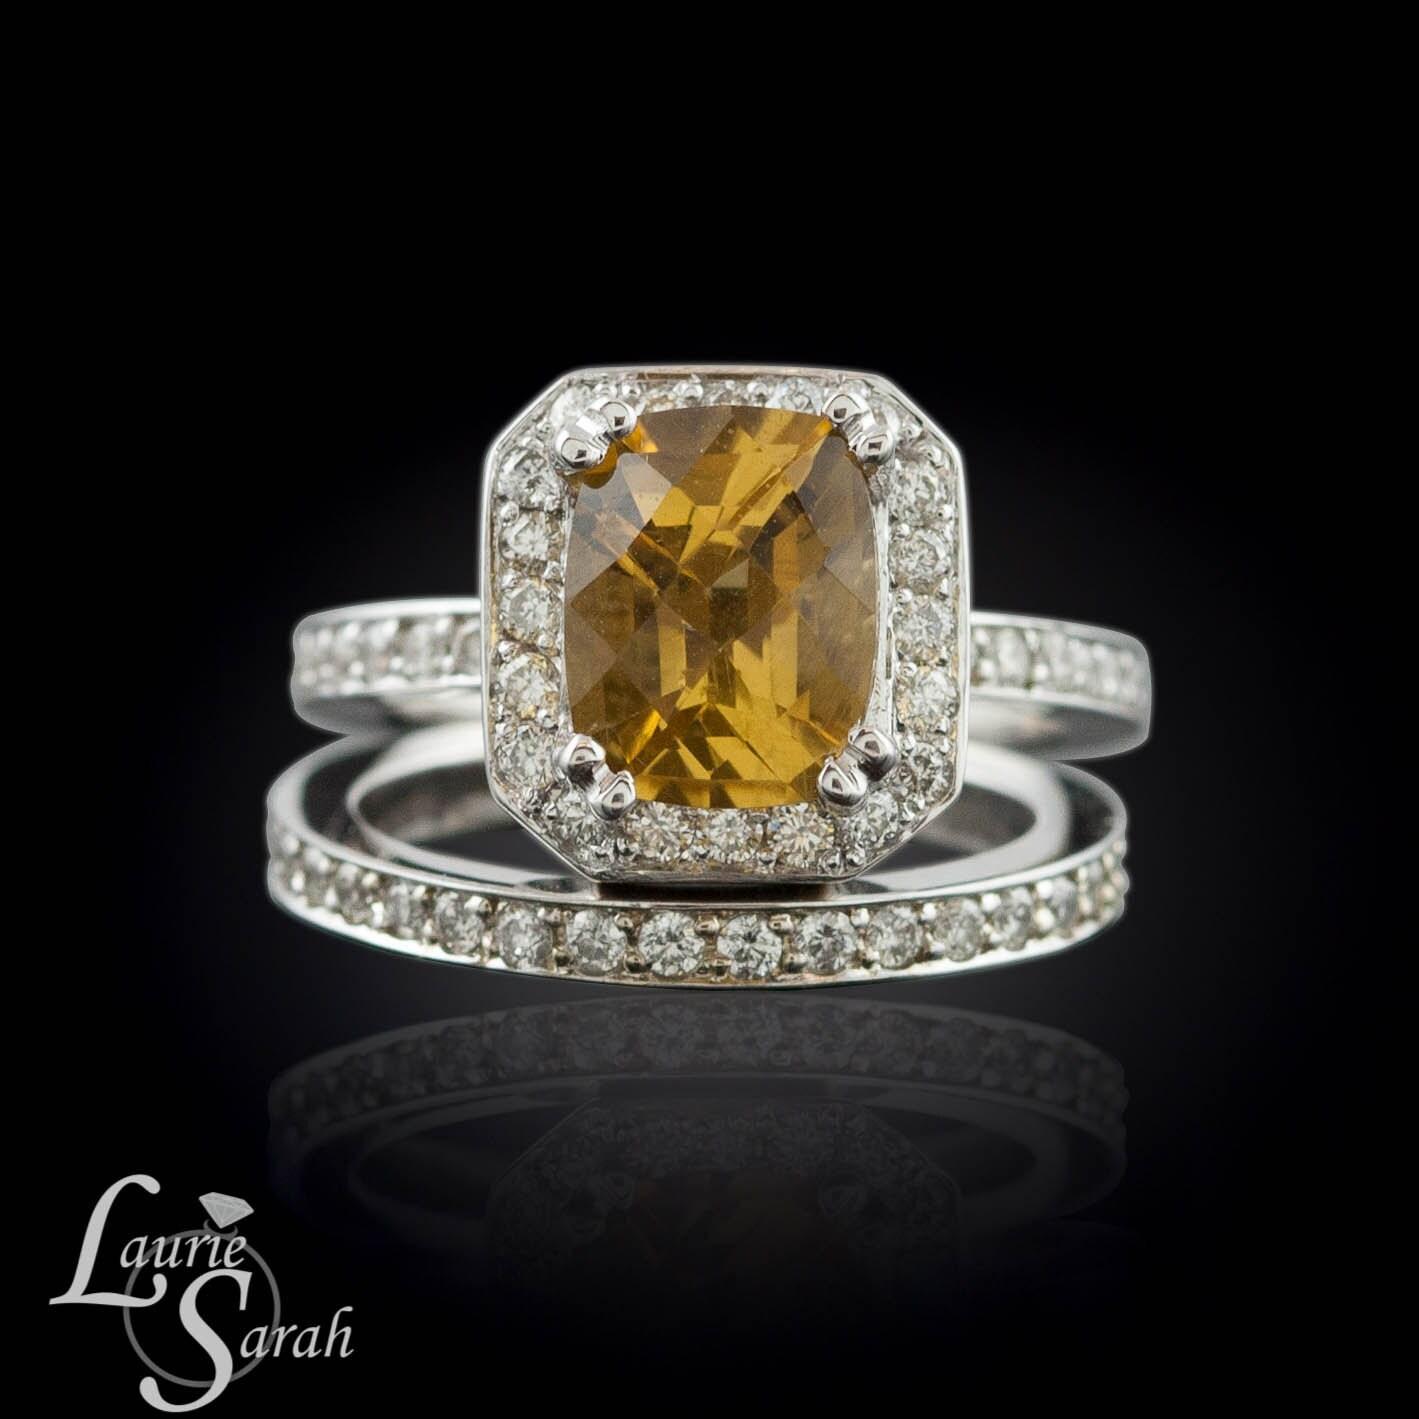 Cushion Cut Engagement Ring Citrine And Diamond Engagement